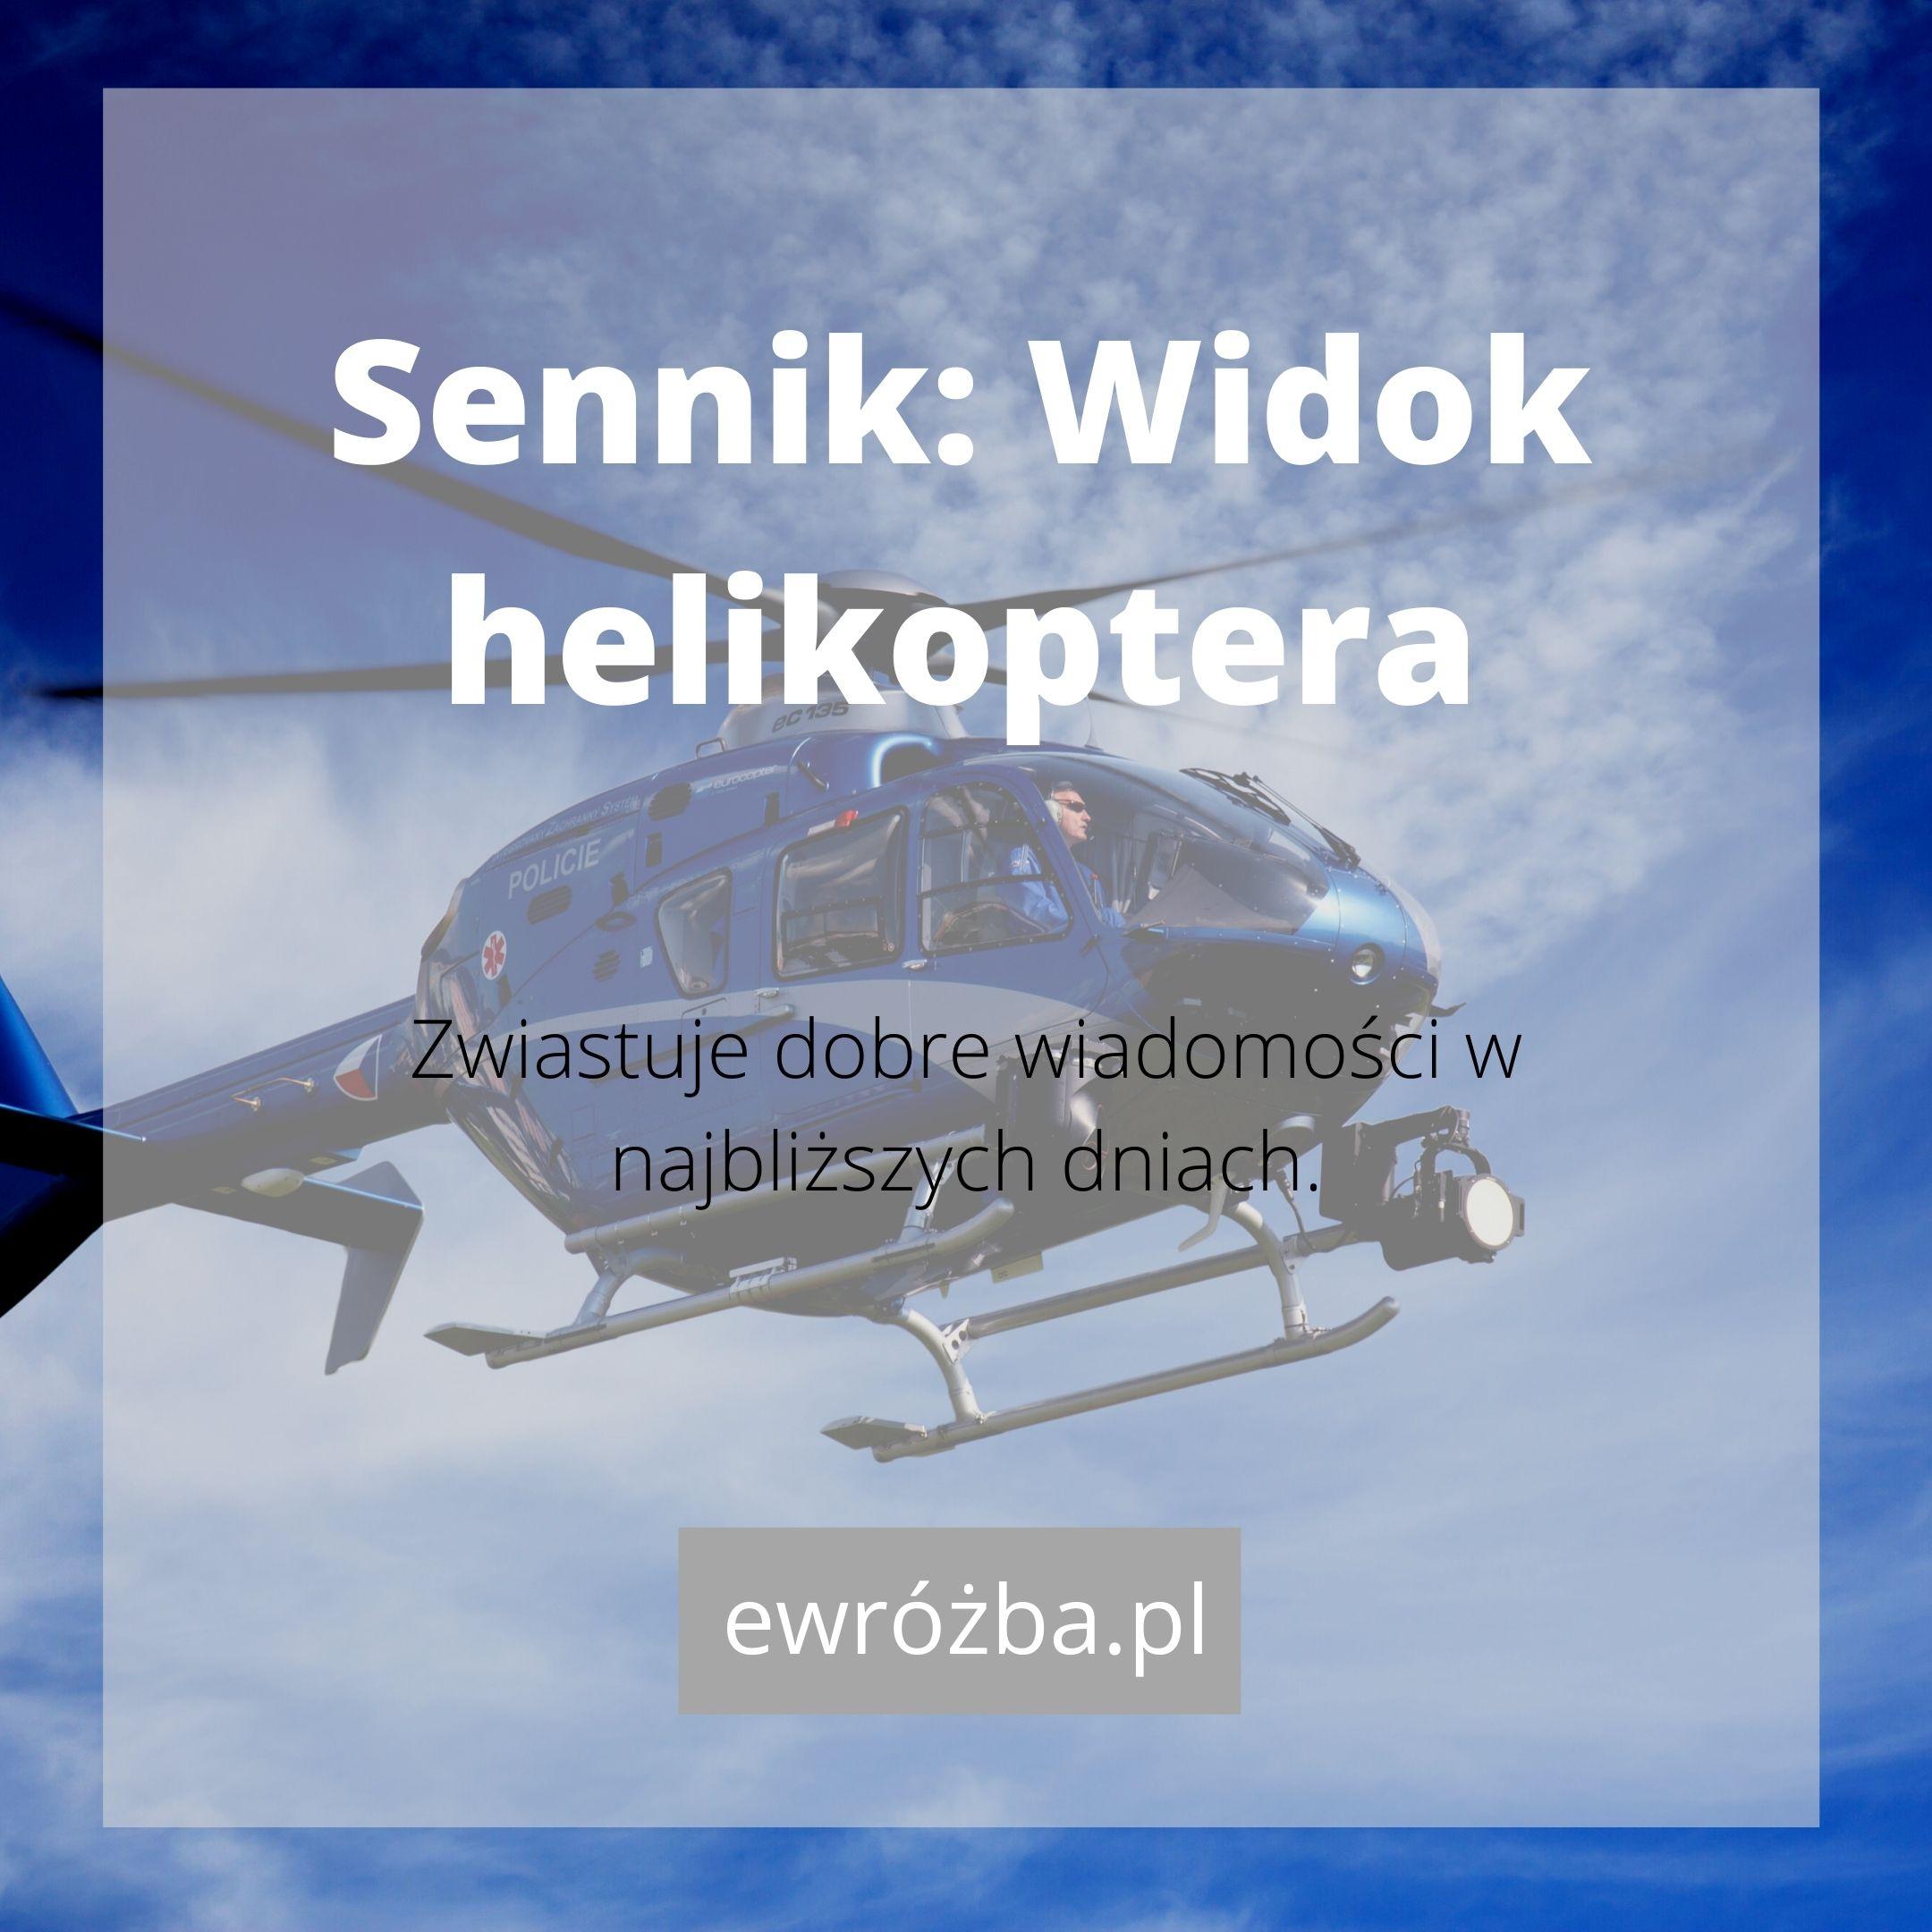 Helikopter w snach 1